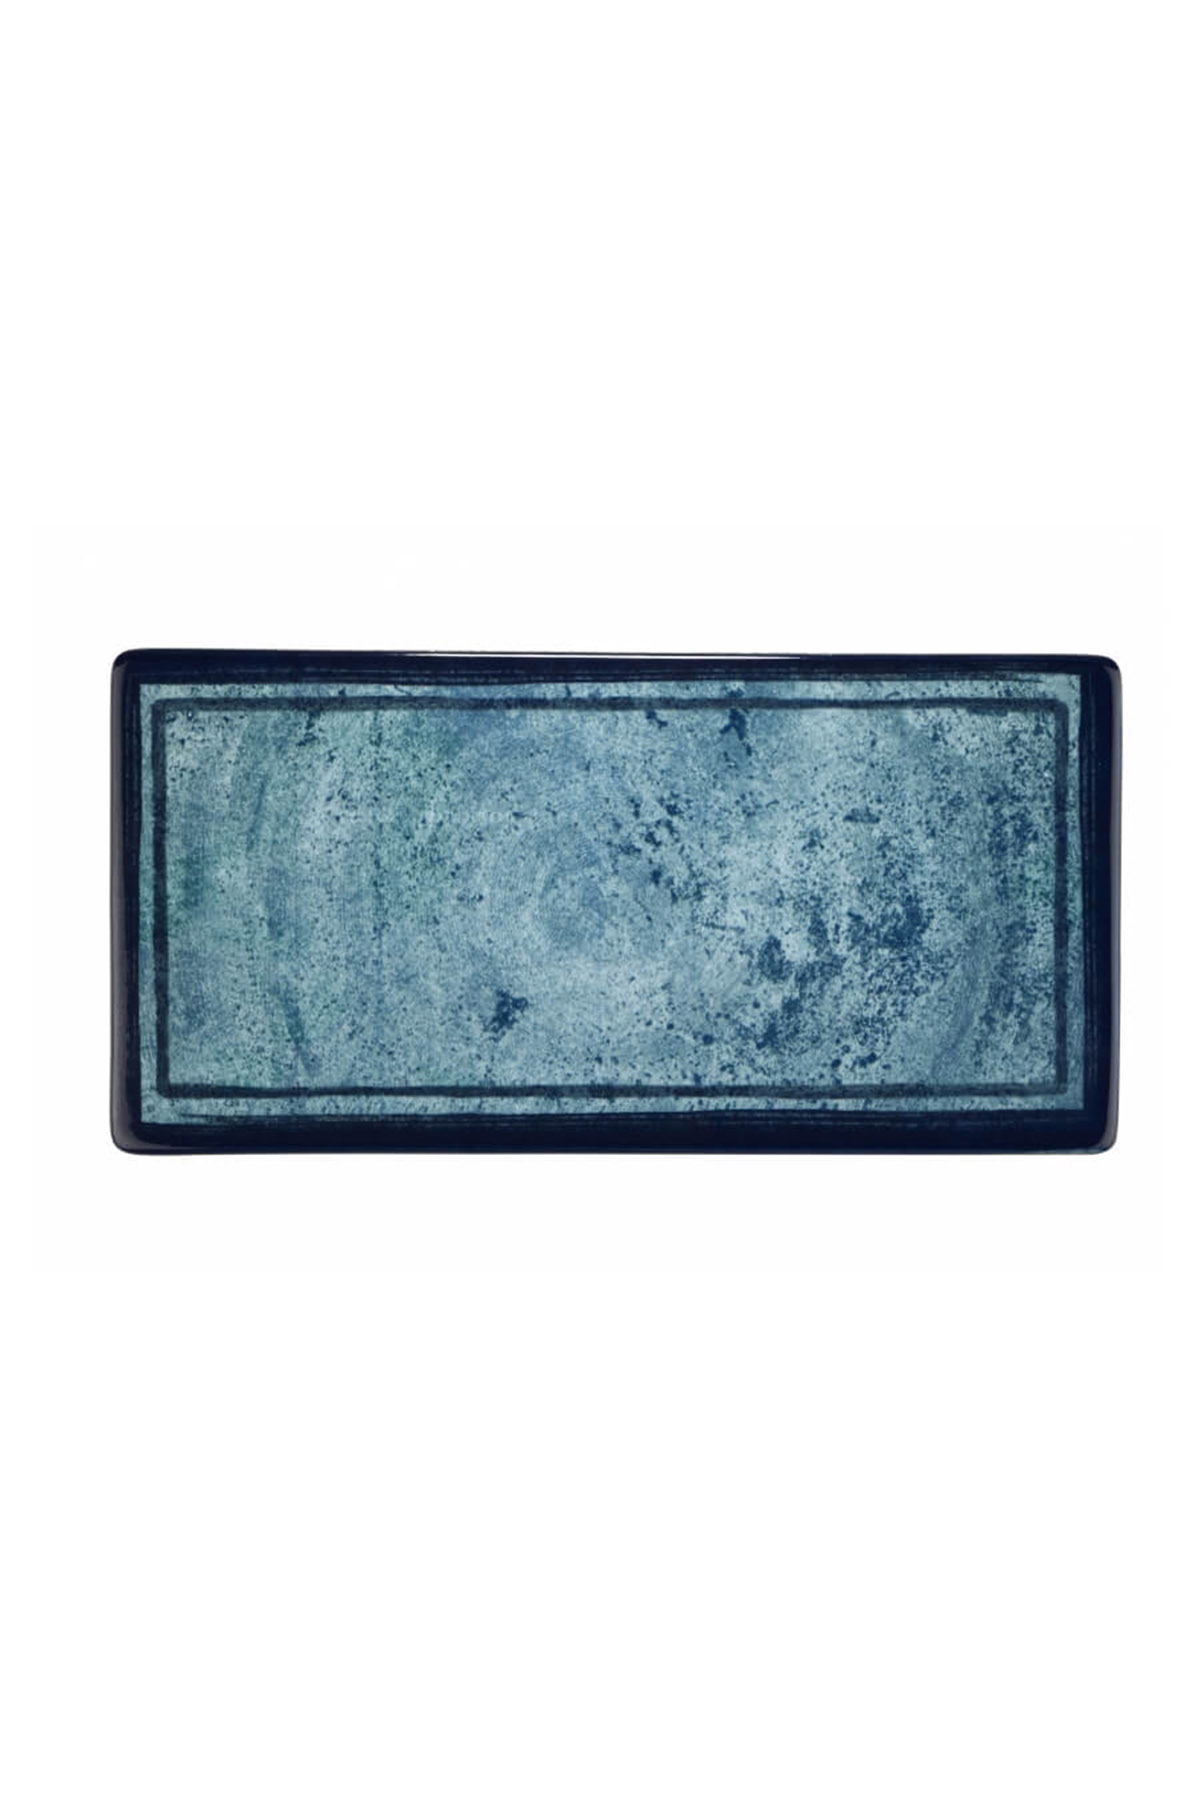 Kütahya Porselen Nanokrem 35x15 cm Düz Tabak 890003